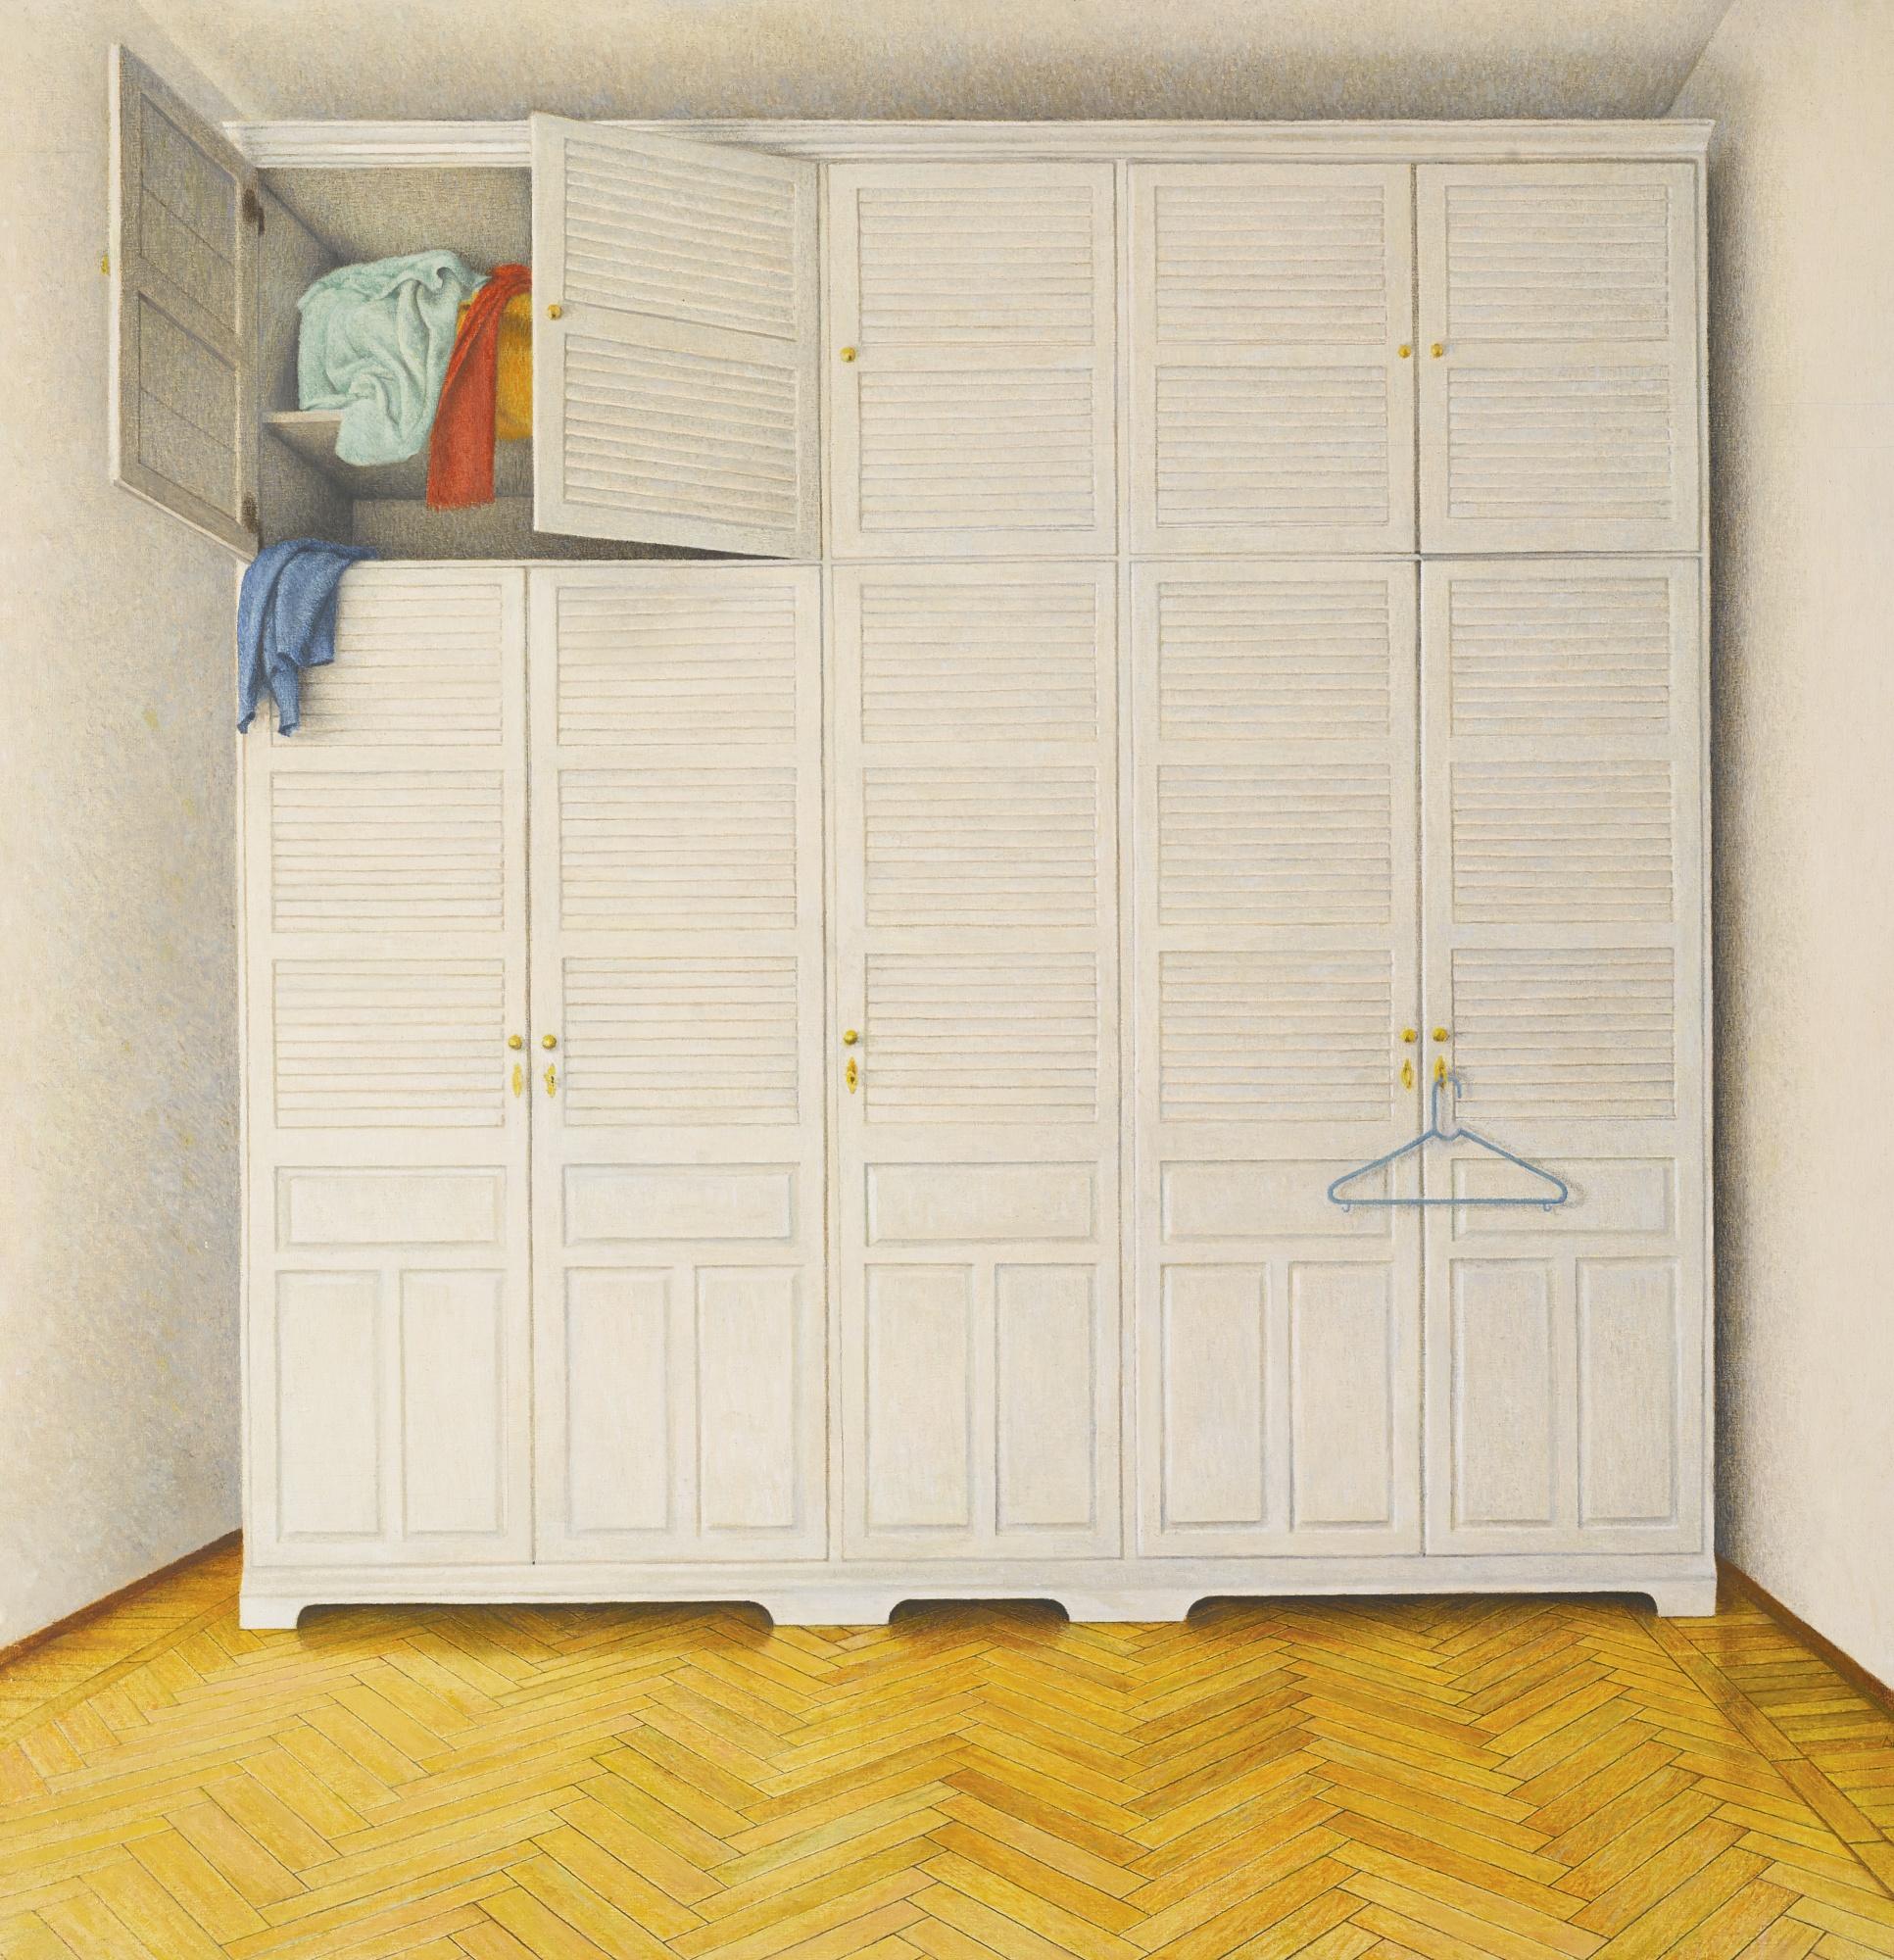 Bernardino Luino-The Wardrobe's Room-1987